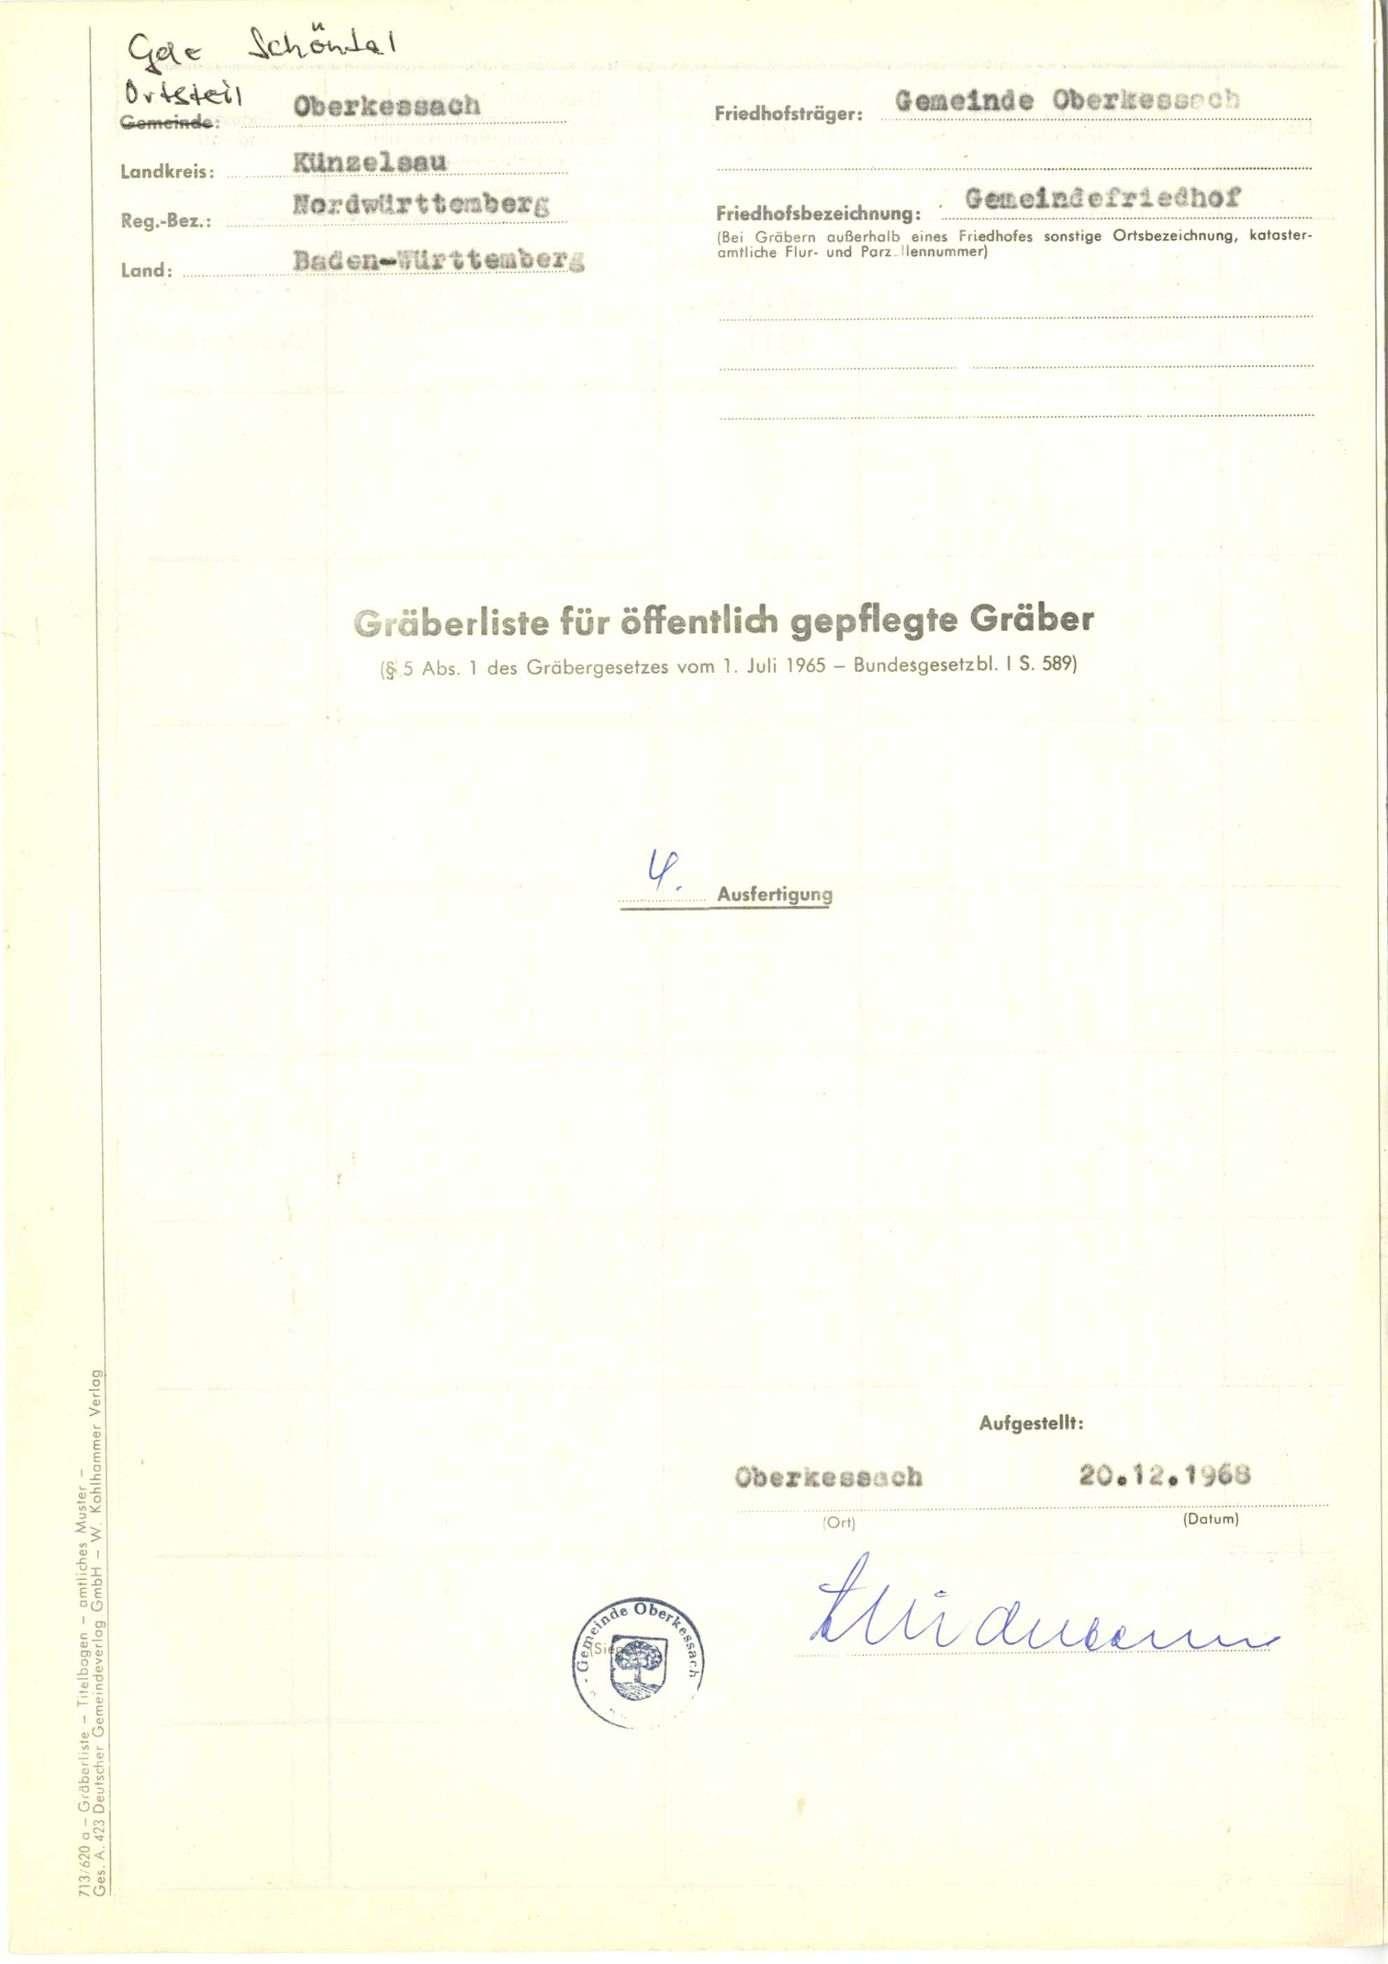 Oberkessach, Bild 1